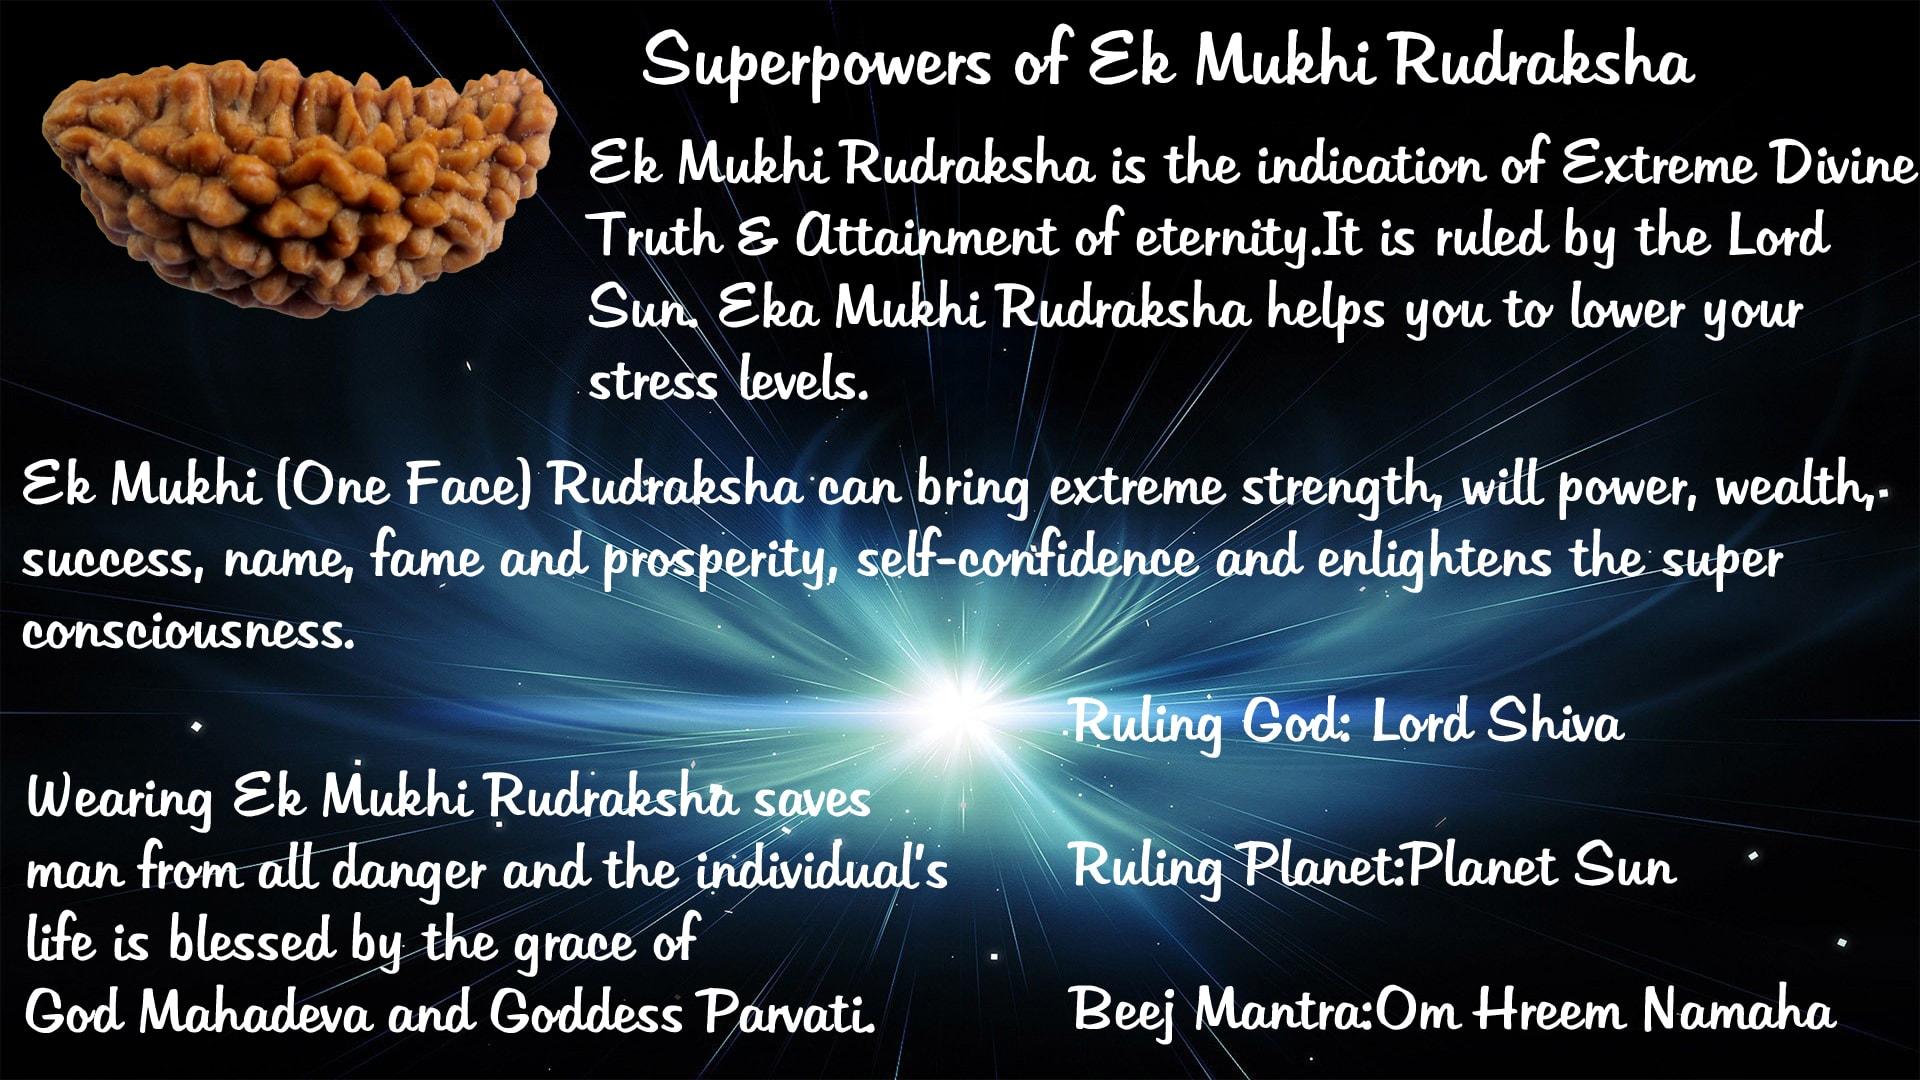 Superpowers of Ek Mukhi Rudraksha